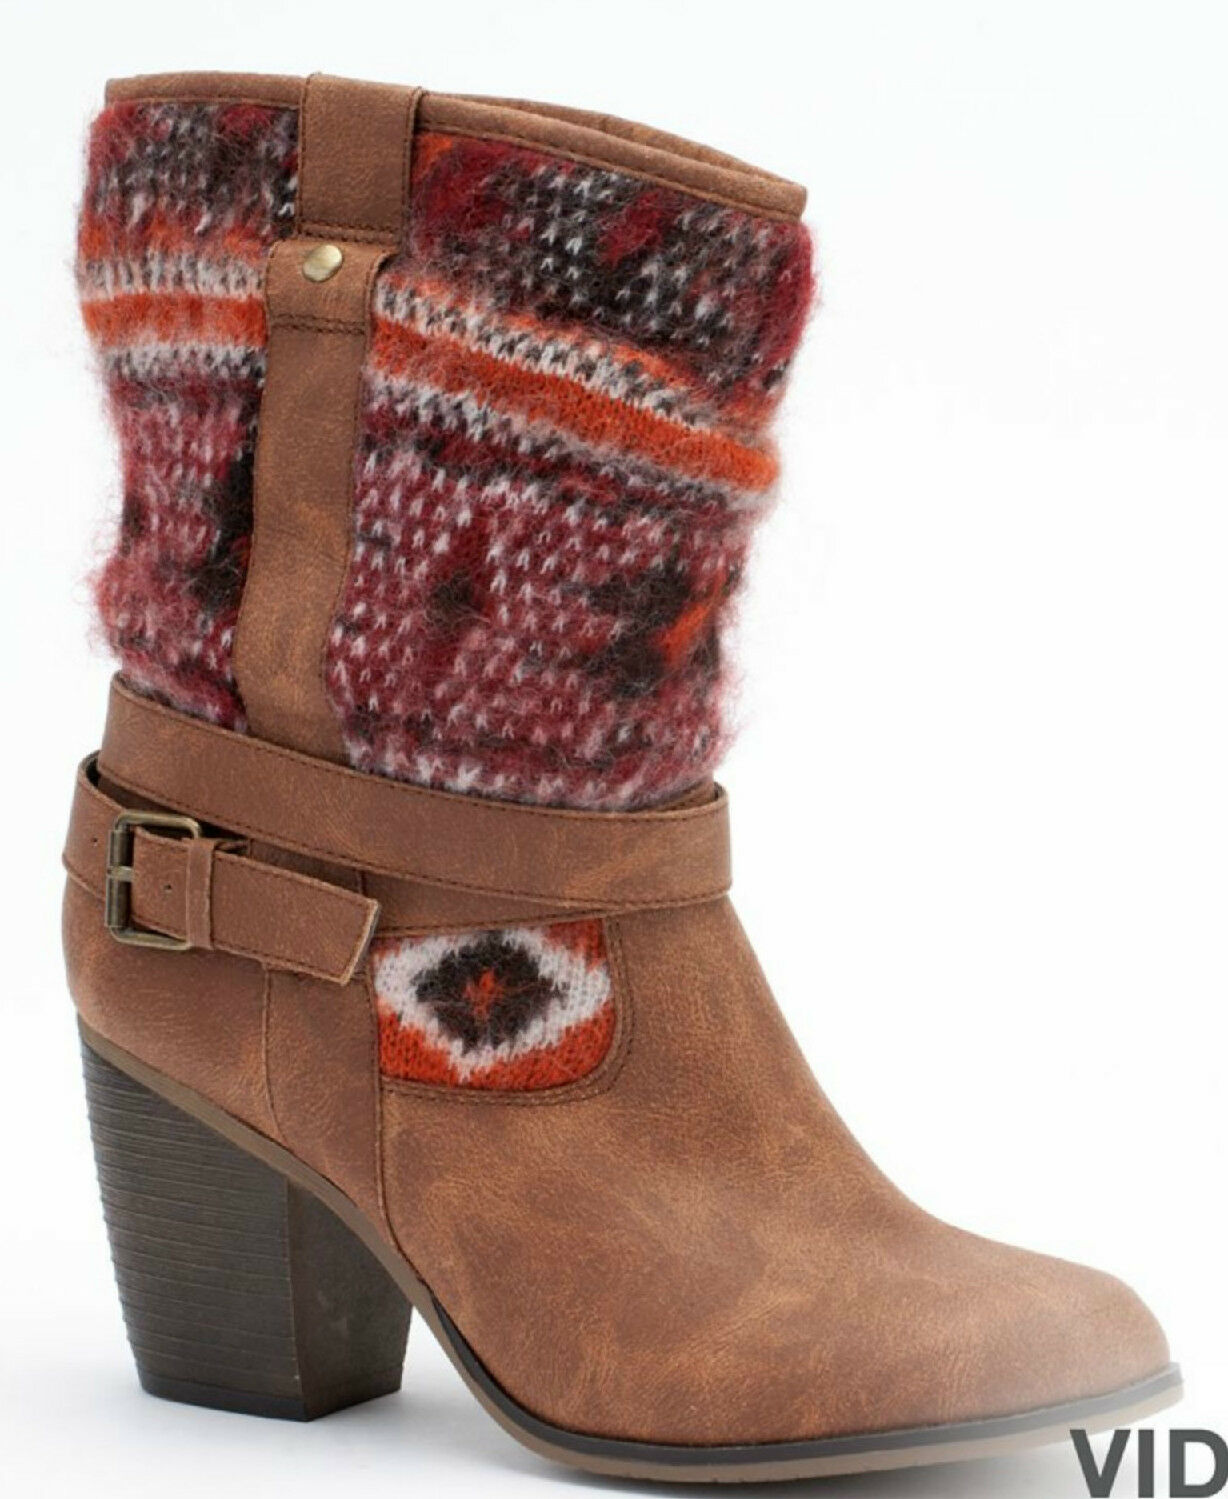 Candies Damenschuhe Mid Calf Braun Stiefel Tribal Pattern 6M 6 M